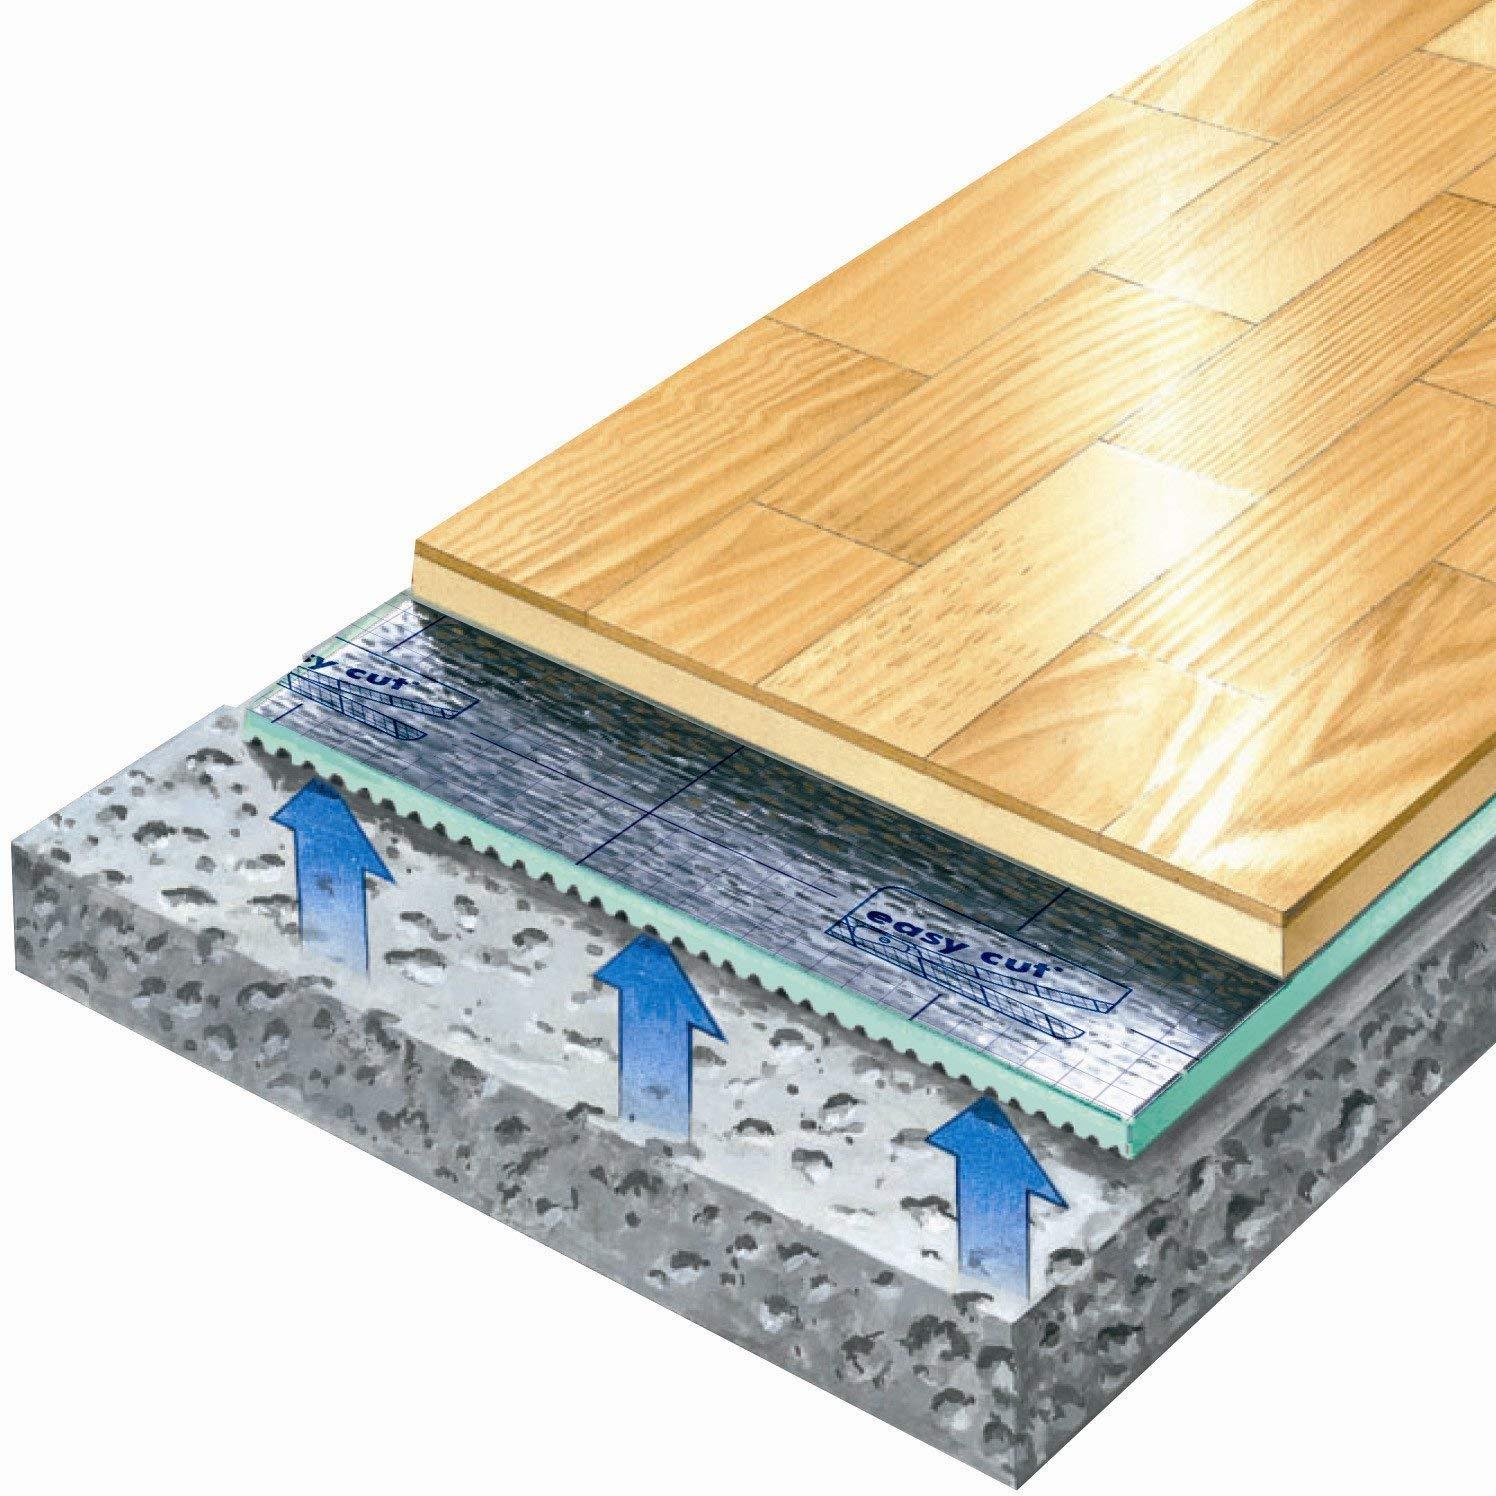 laminate underlayment shaw selitac underlayment laminate/hardwood 100sf - carpet underlayments -  amazon.com NECOSBY